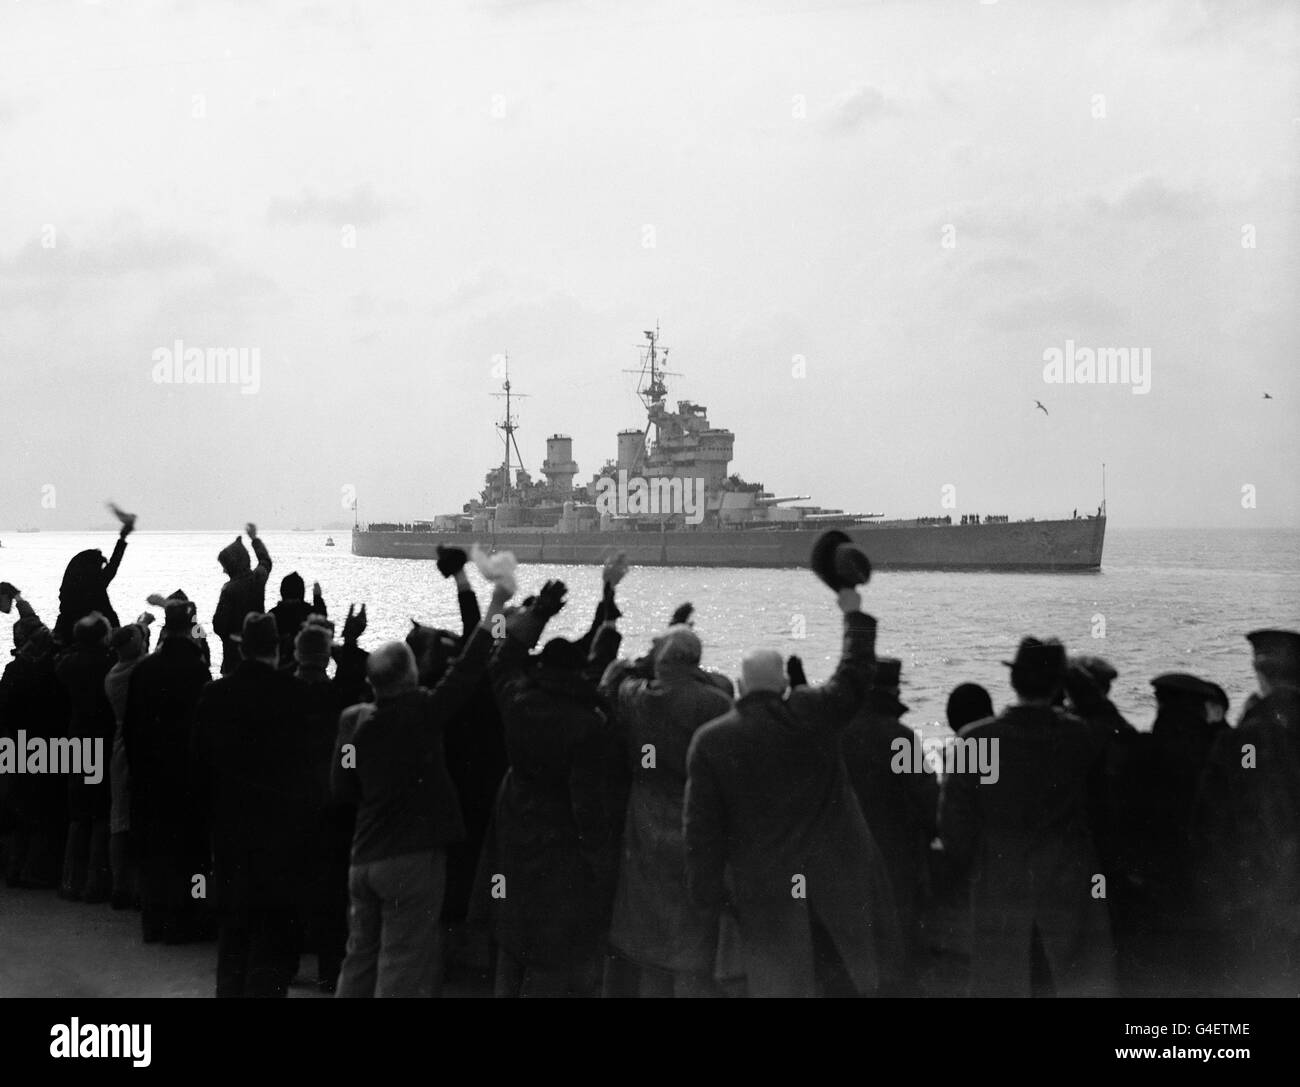 Military - King George V Battleship - Portsmouth - Stock Image